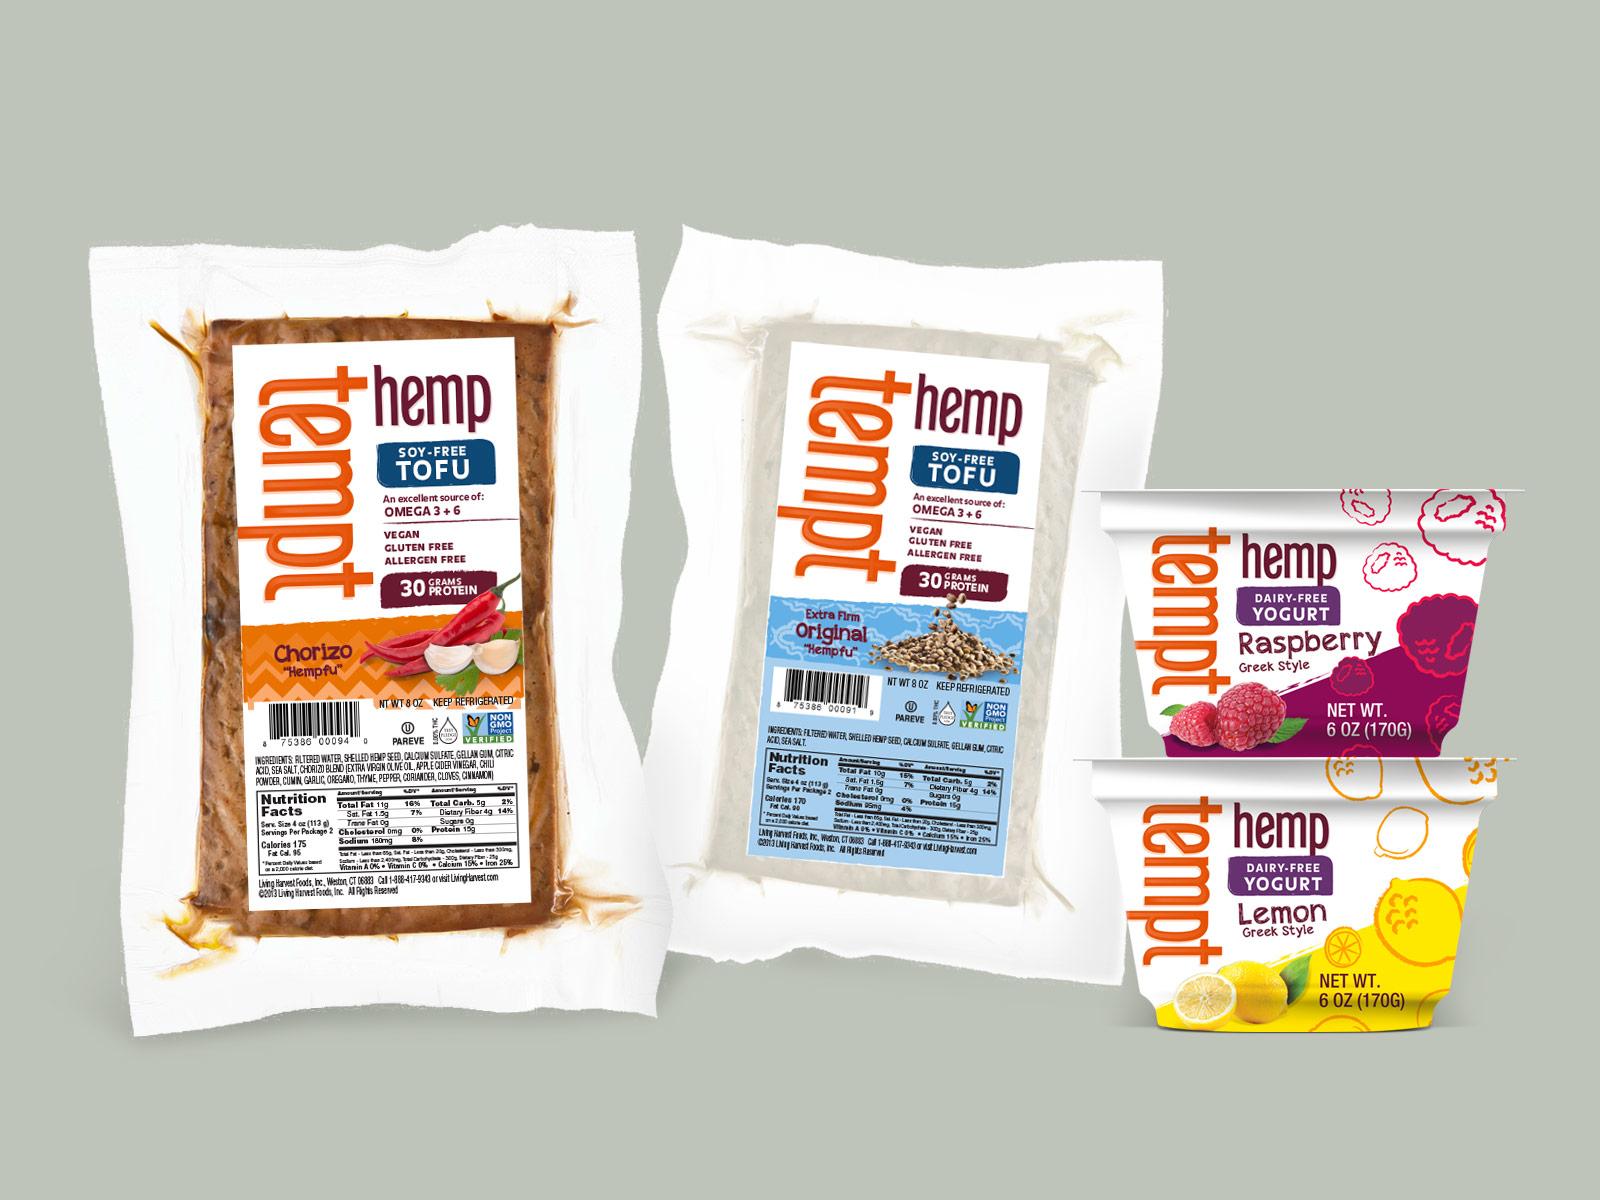 Hemp-based Tofu and Yogurt by jothan